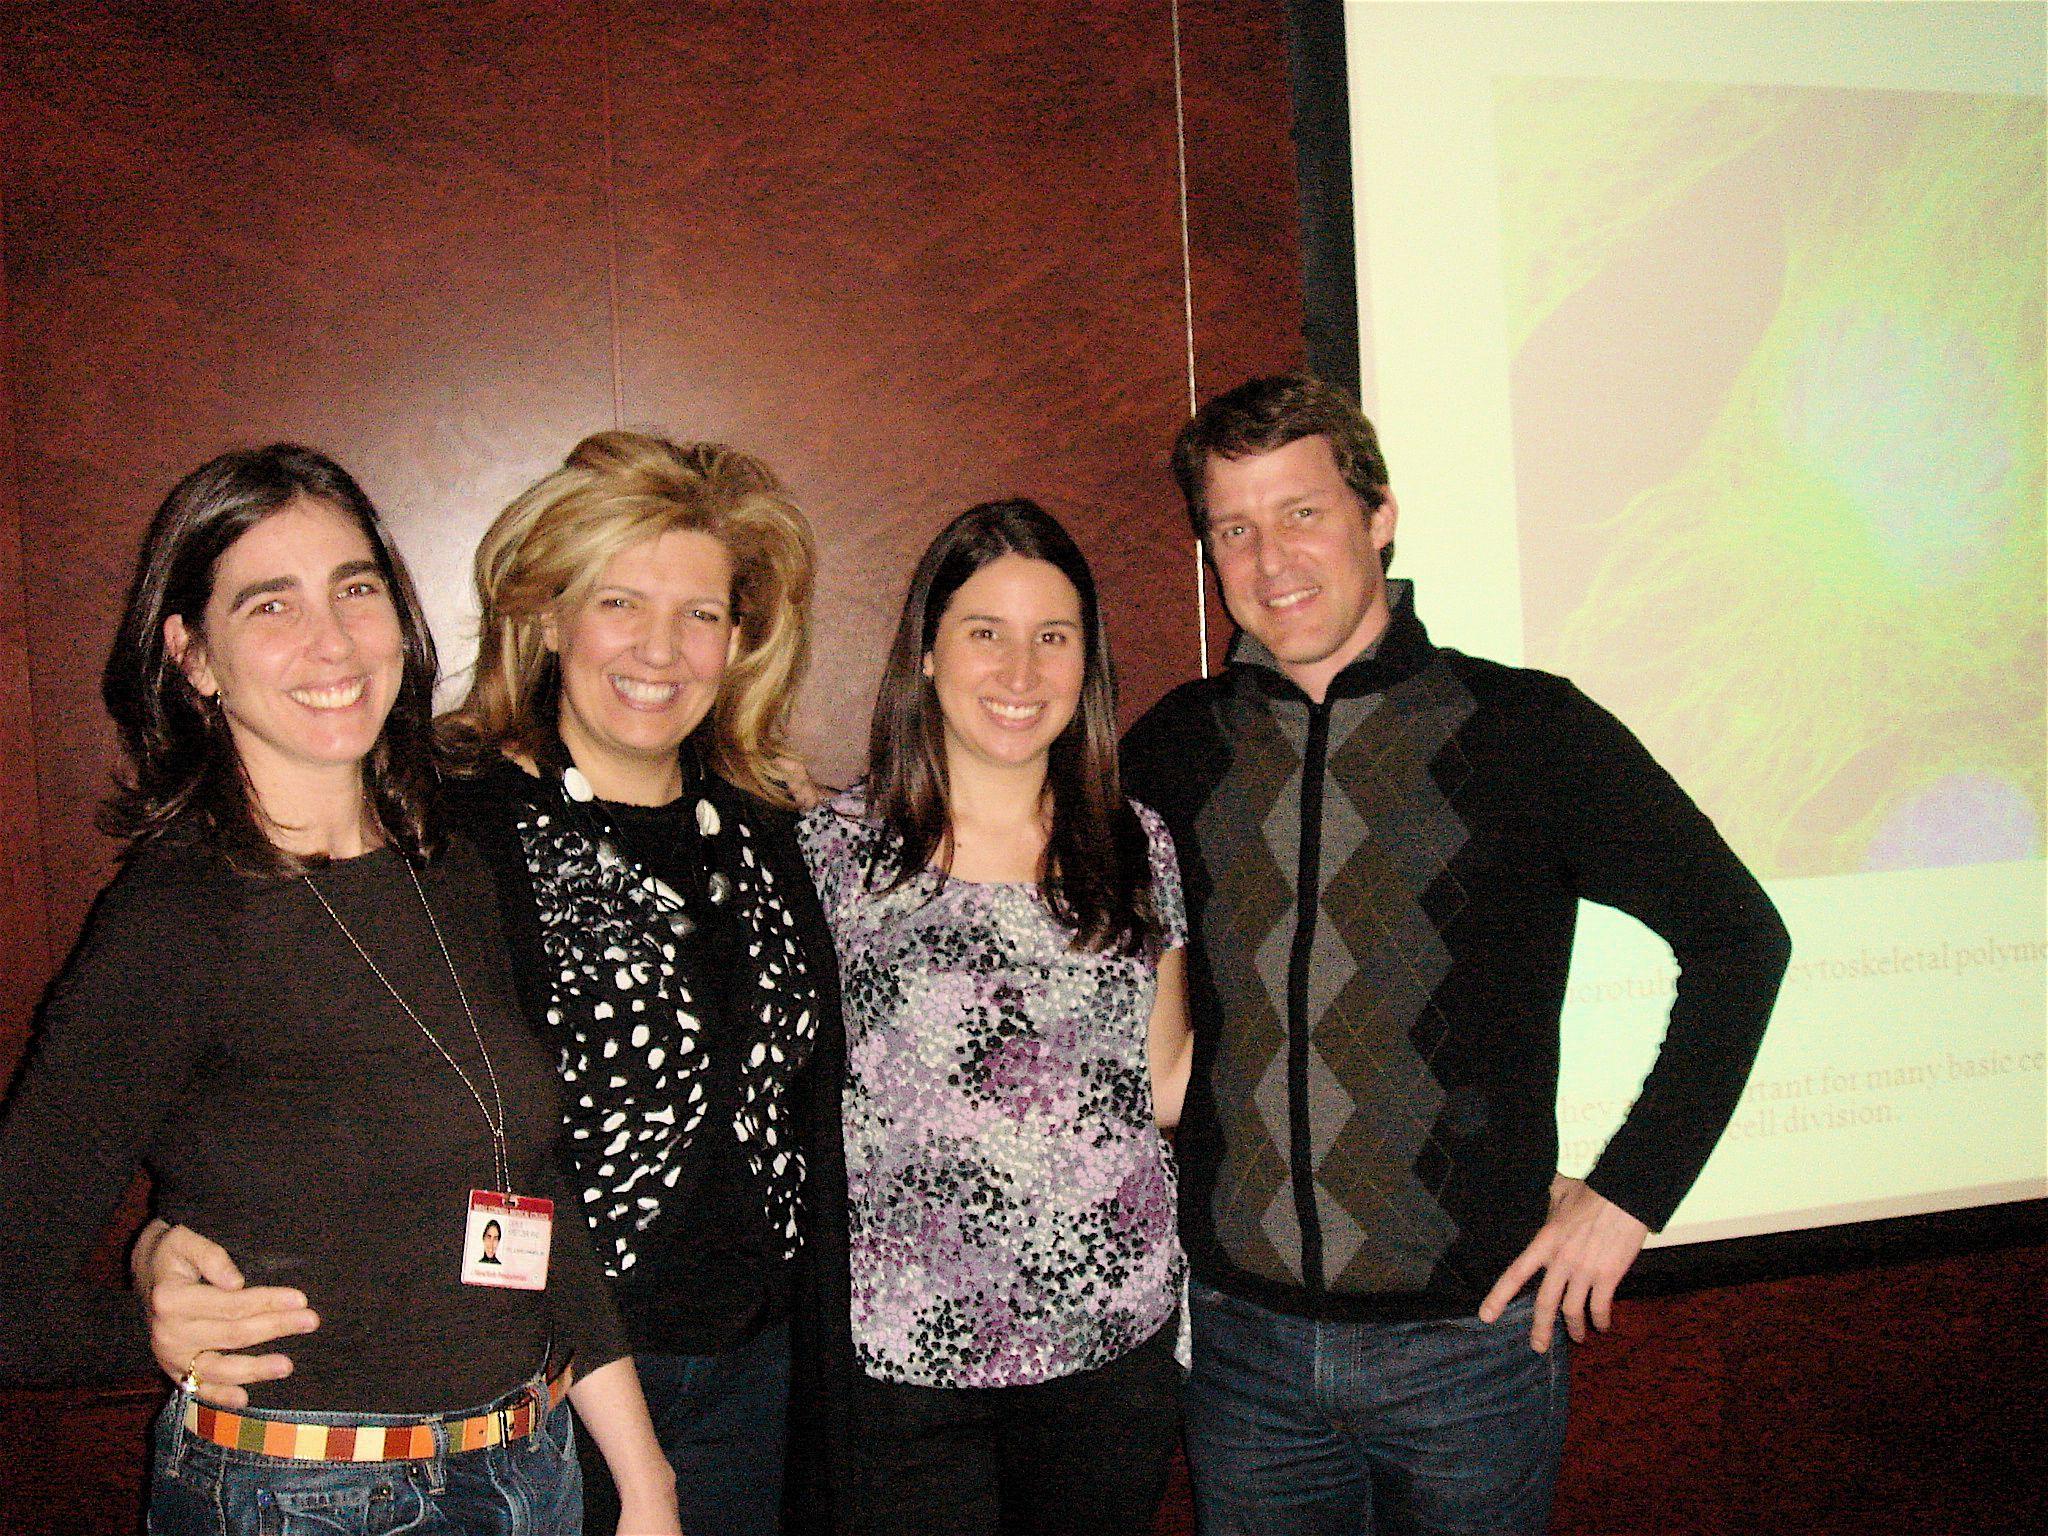 Dr. Geri Kreitzer; Dr. Evi Giannakakou, Marisa's thesis advisor; Marisa Carbonaro; and Dr. Scott Blanchard.